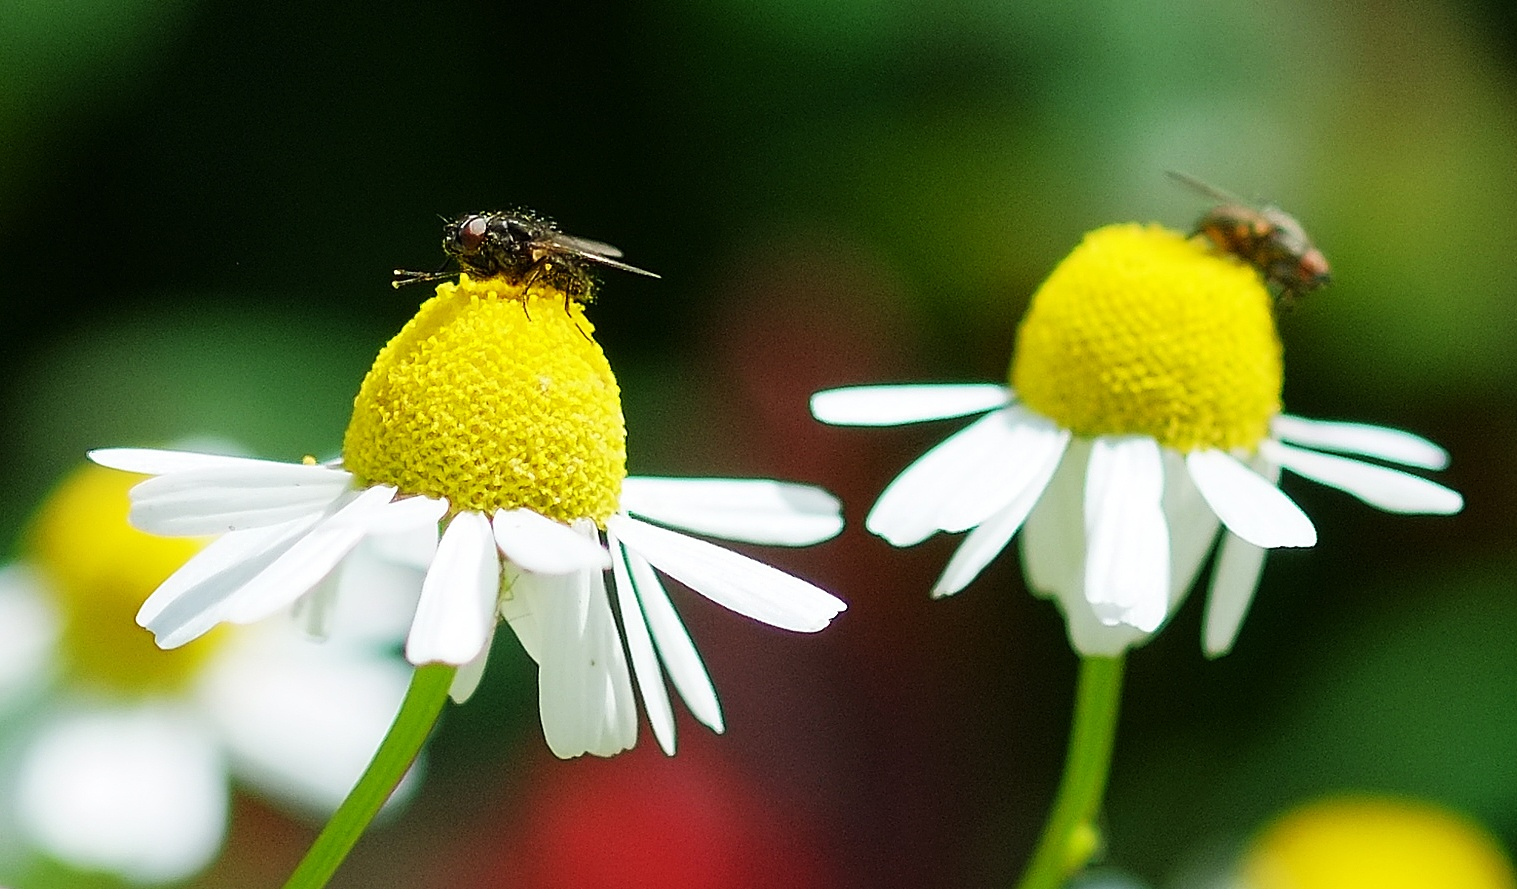 Flies on Feverfew by Pete Hussey